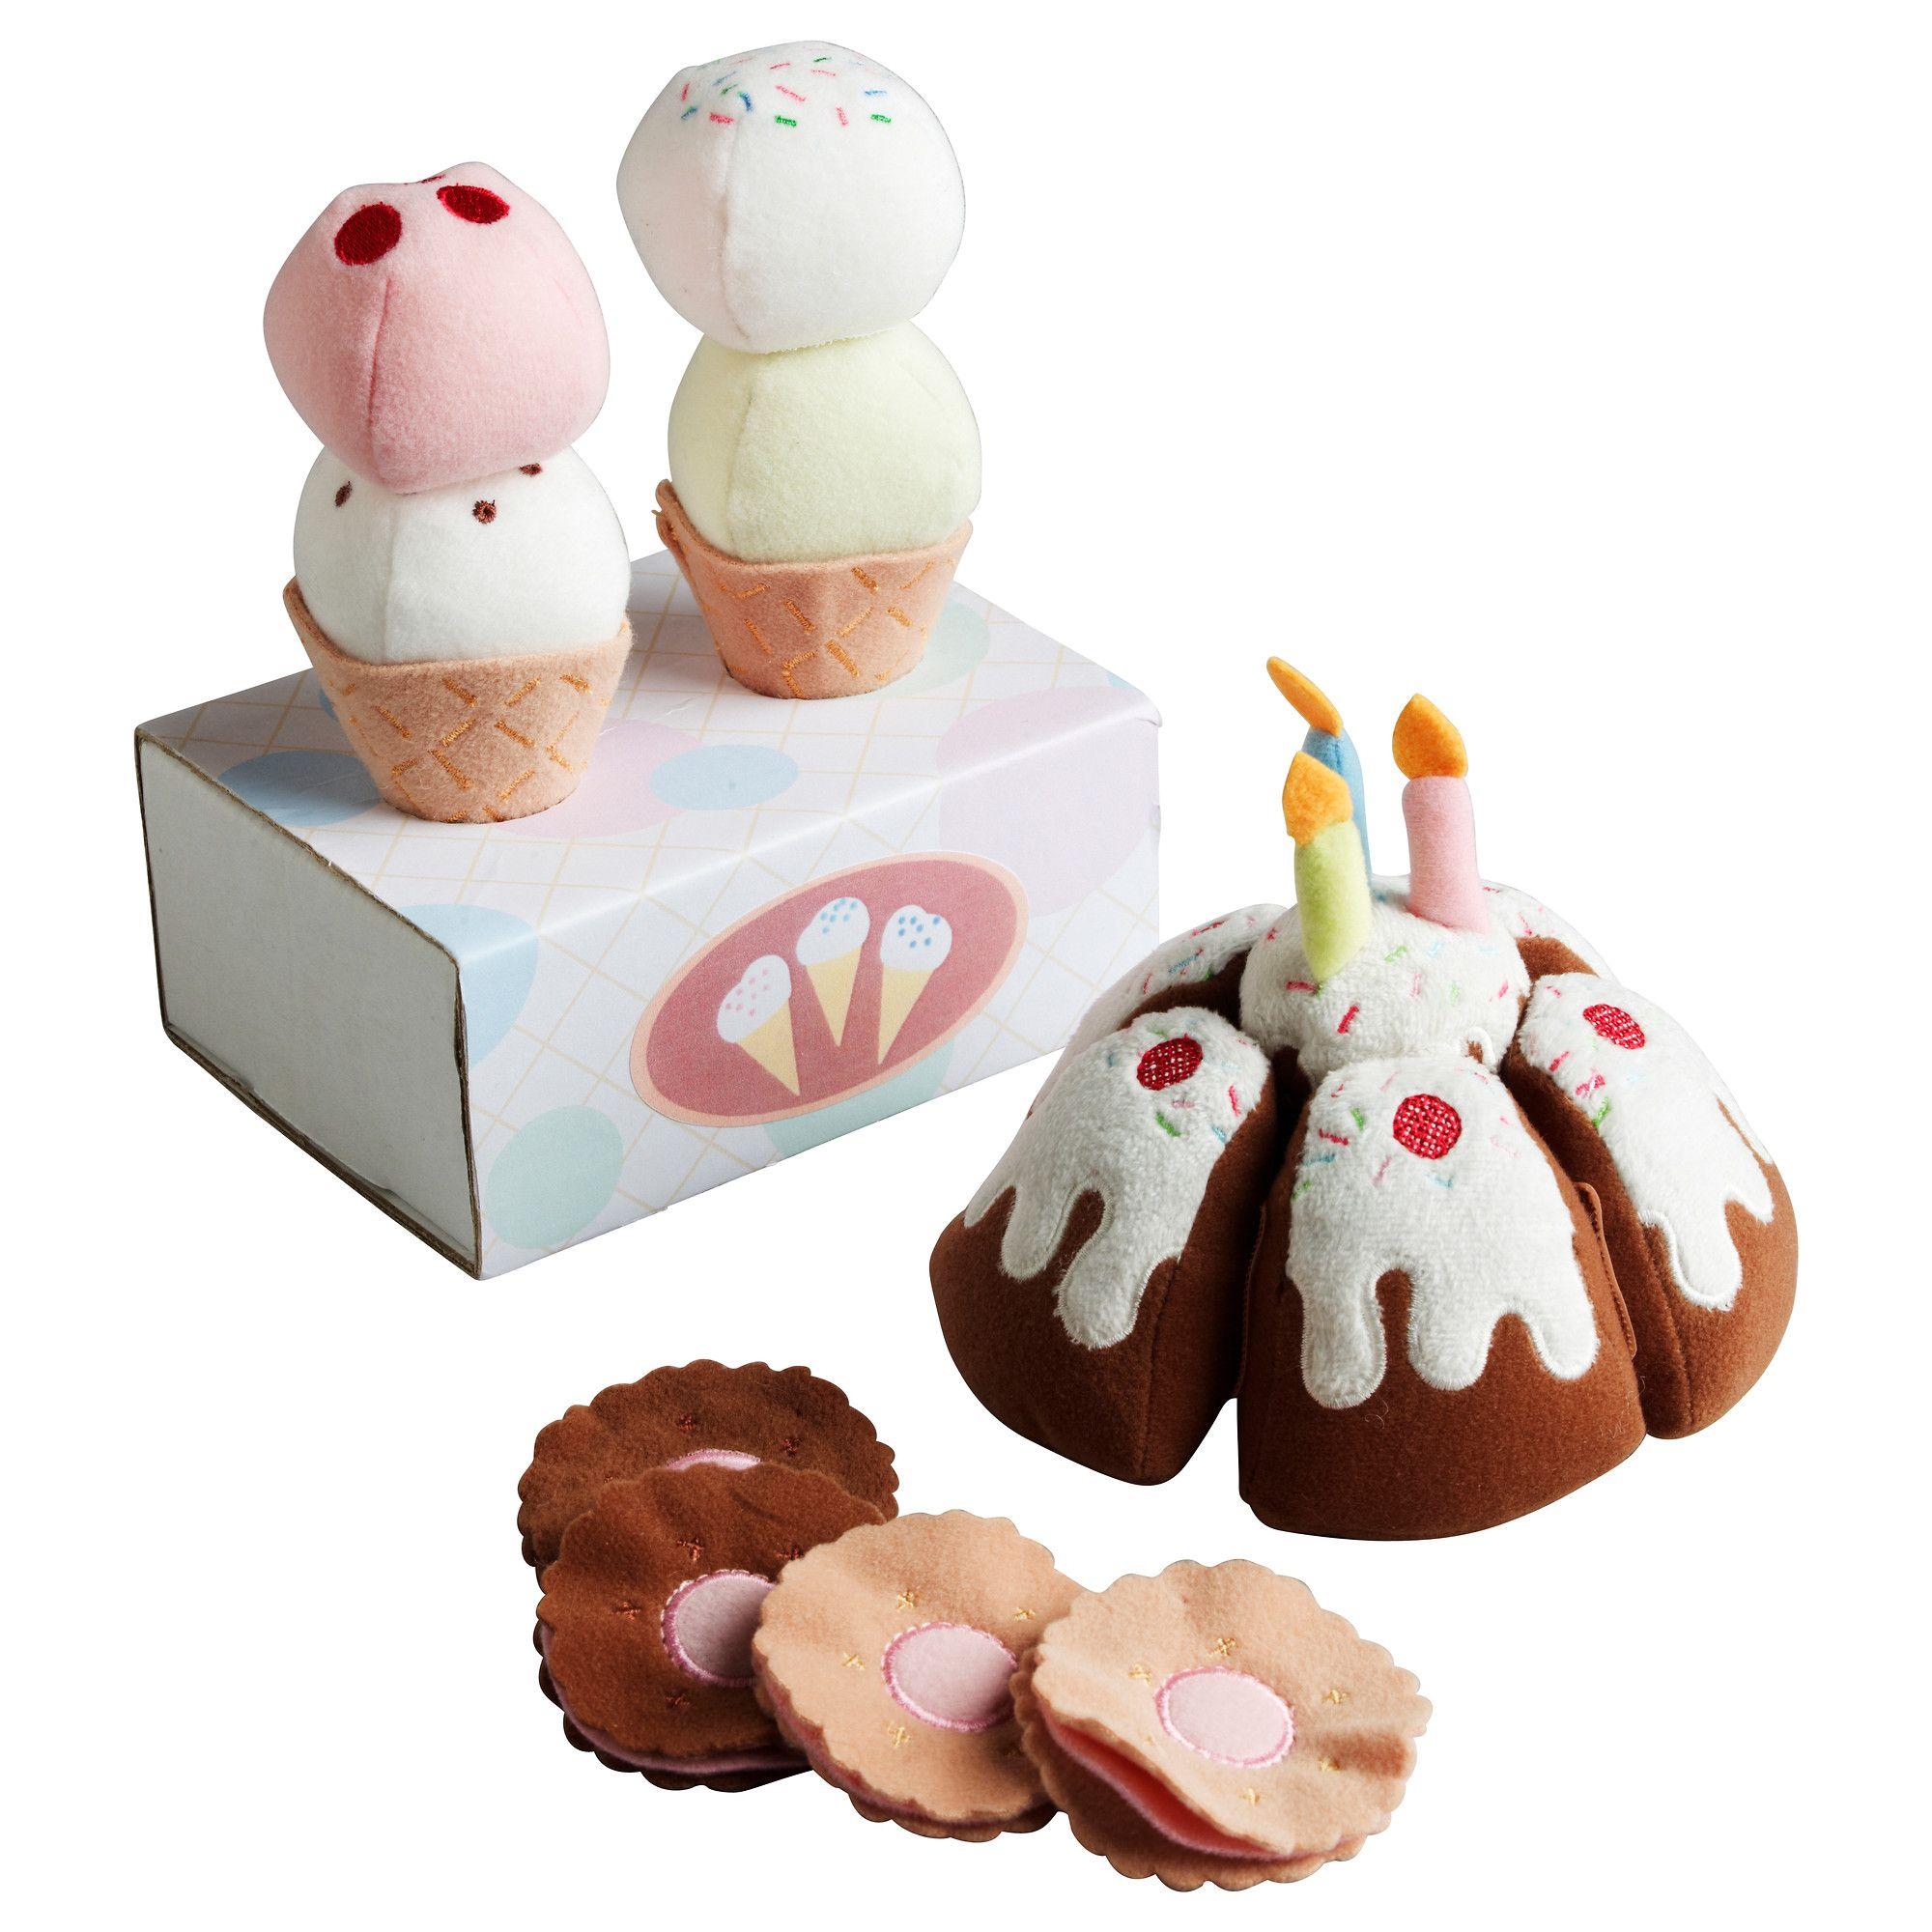 $7.99 DUKTIG 18-piece dessert set - IKEA | RIO 4 BDAY/XMAS ...